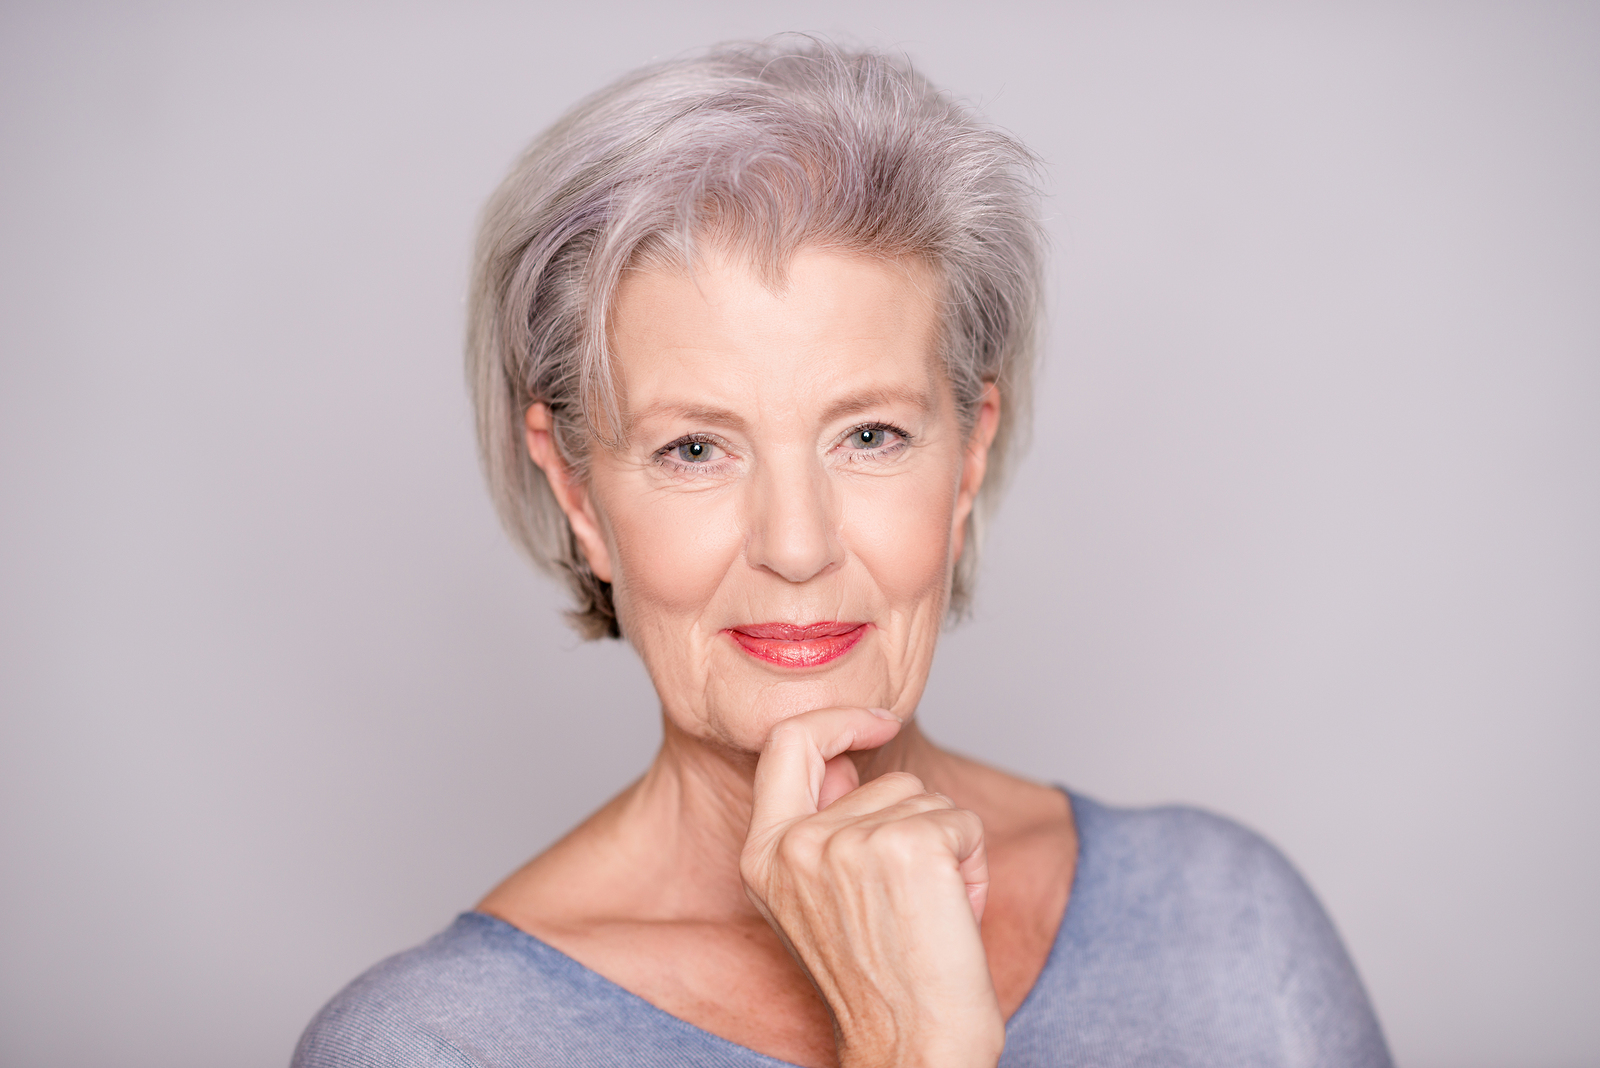 Senior Mature Women 52